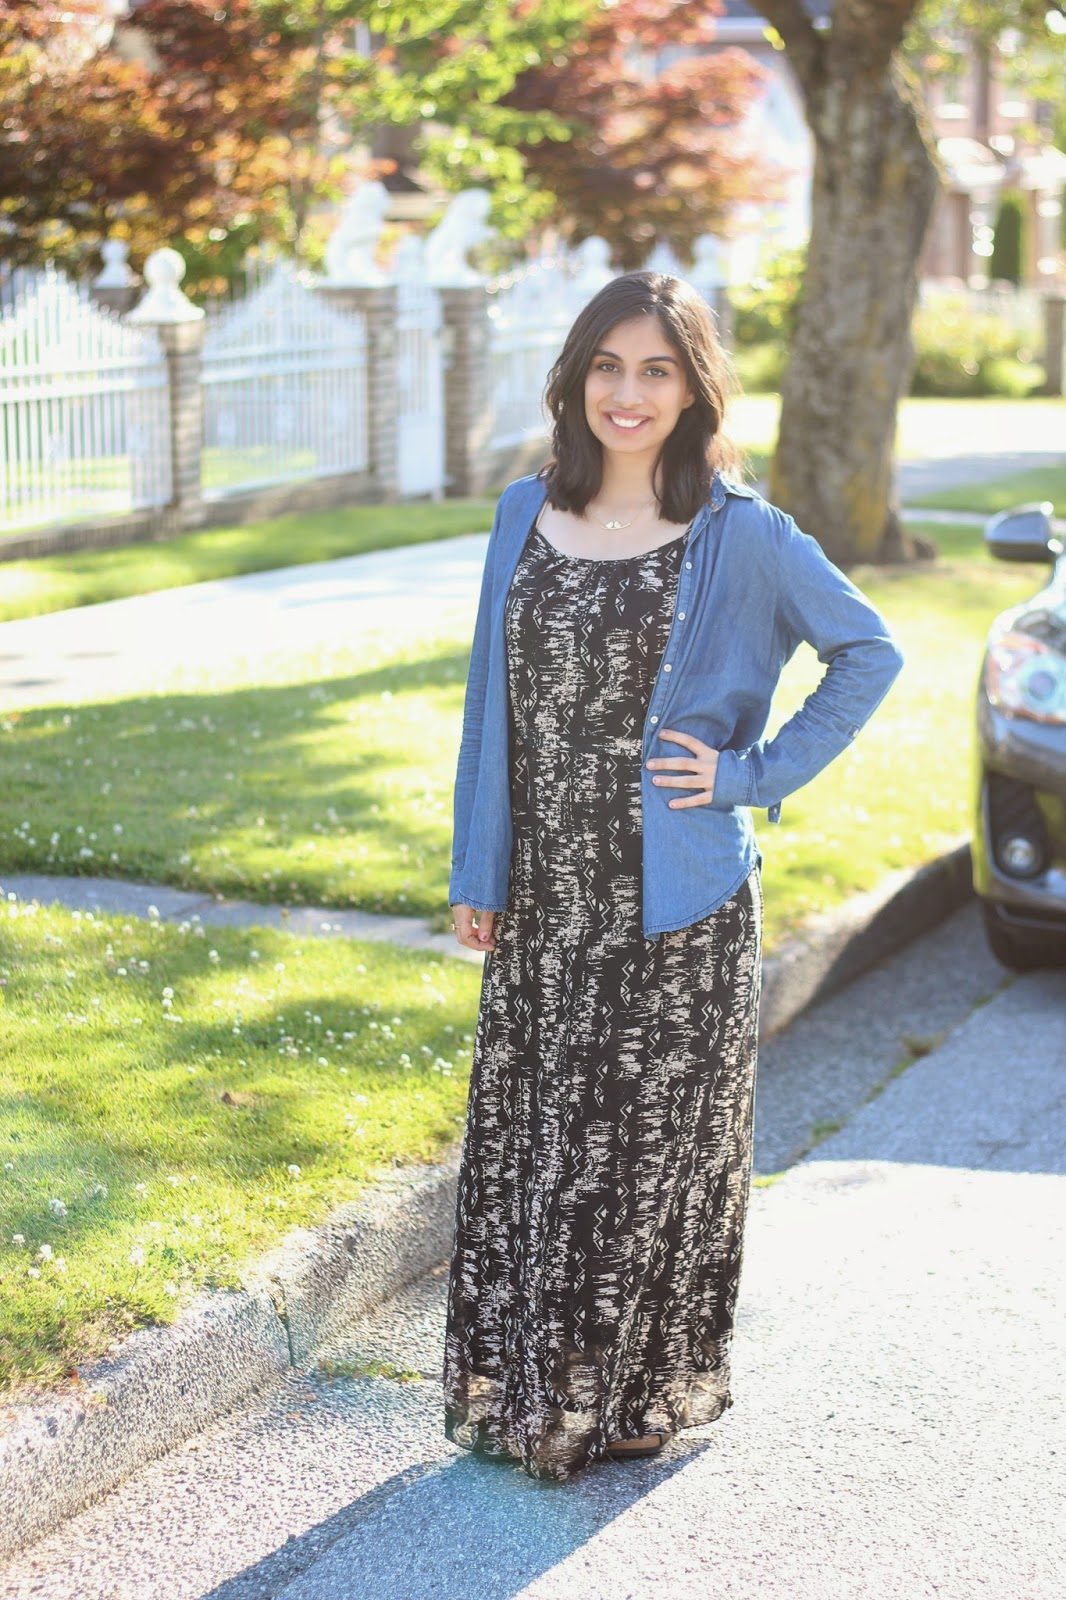 3 ways to wear a maxi dress - maxi dress with chambray shirt